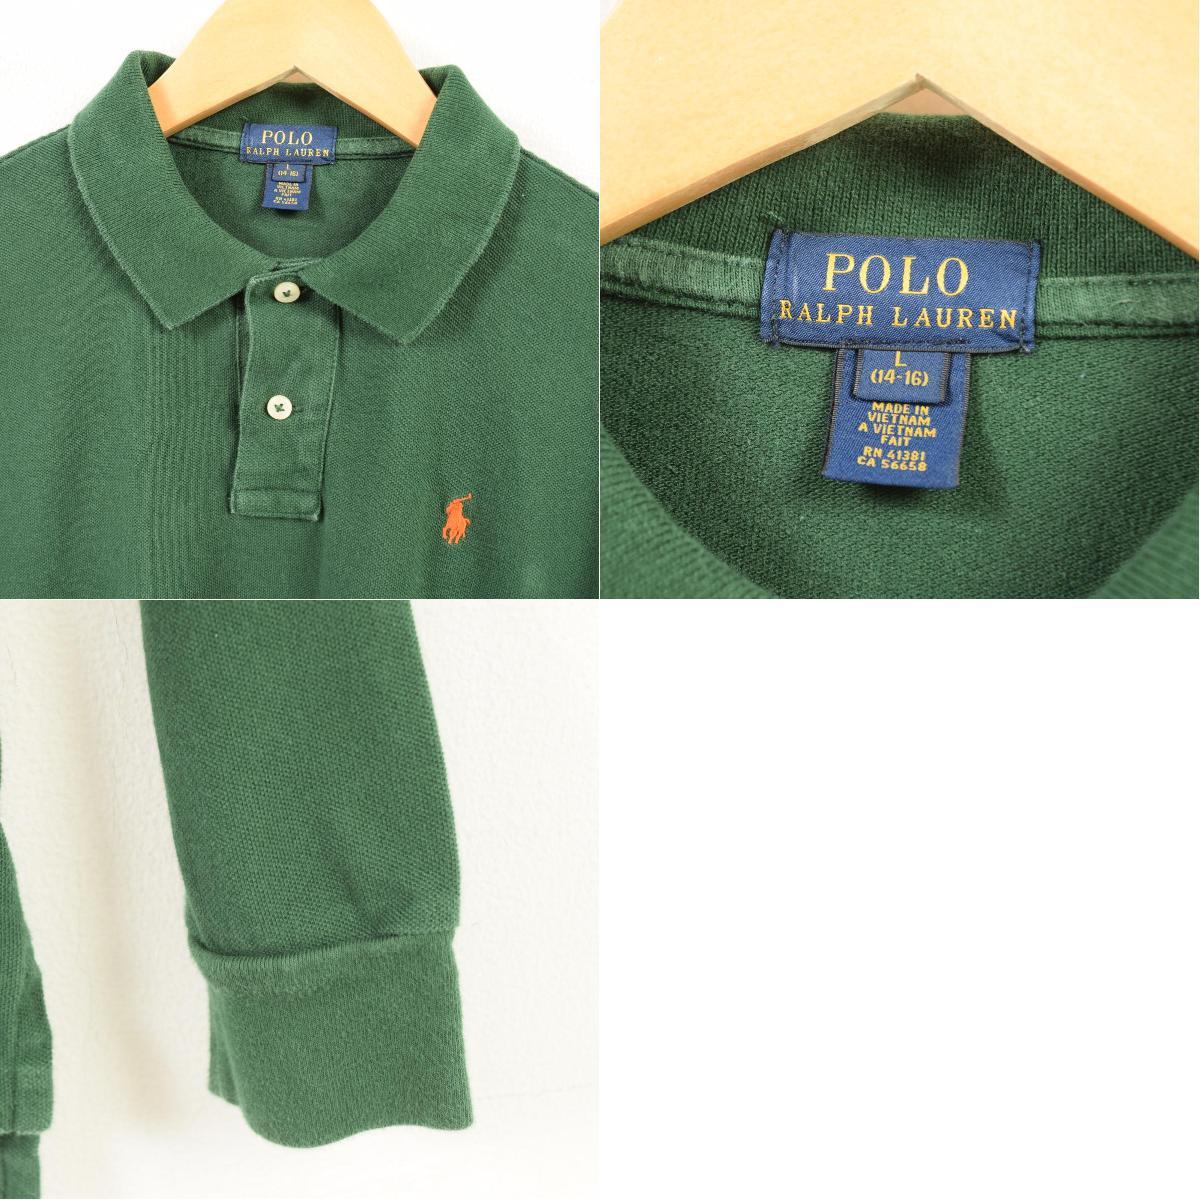 M Long Waq1888 Ralph Polo Lady's Sleeves Shirt Lauren lKcT1JF